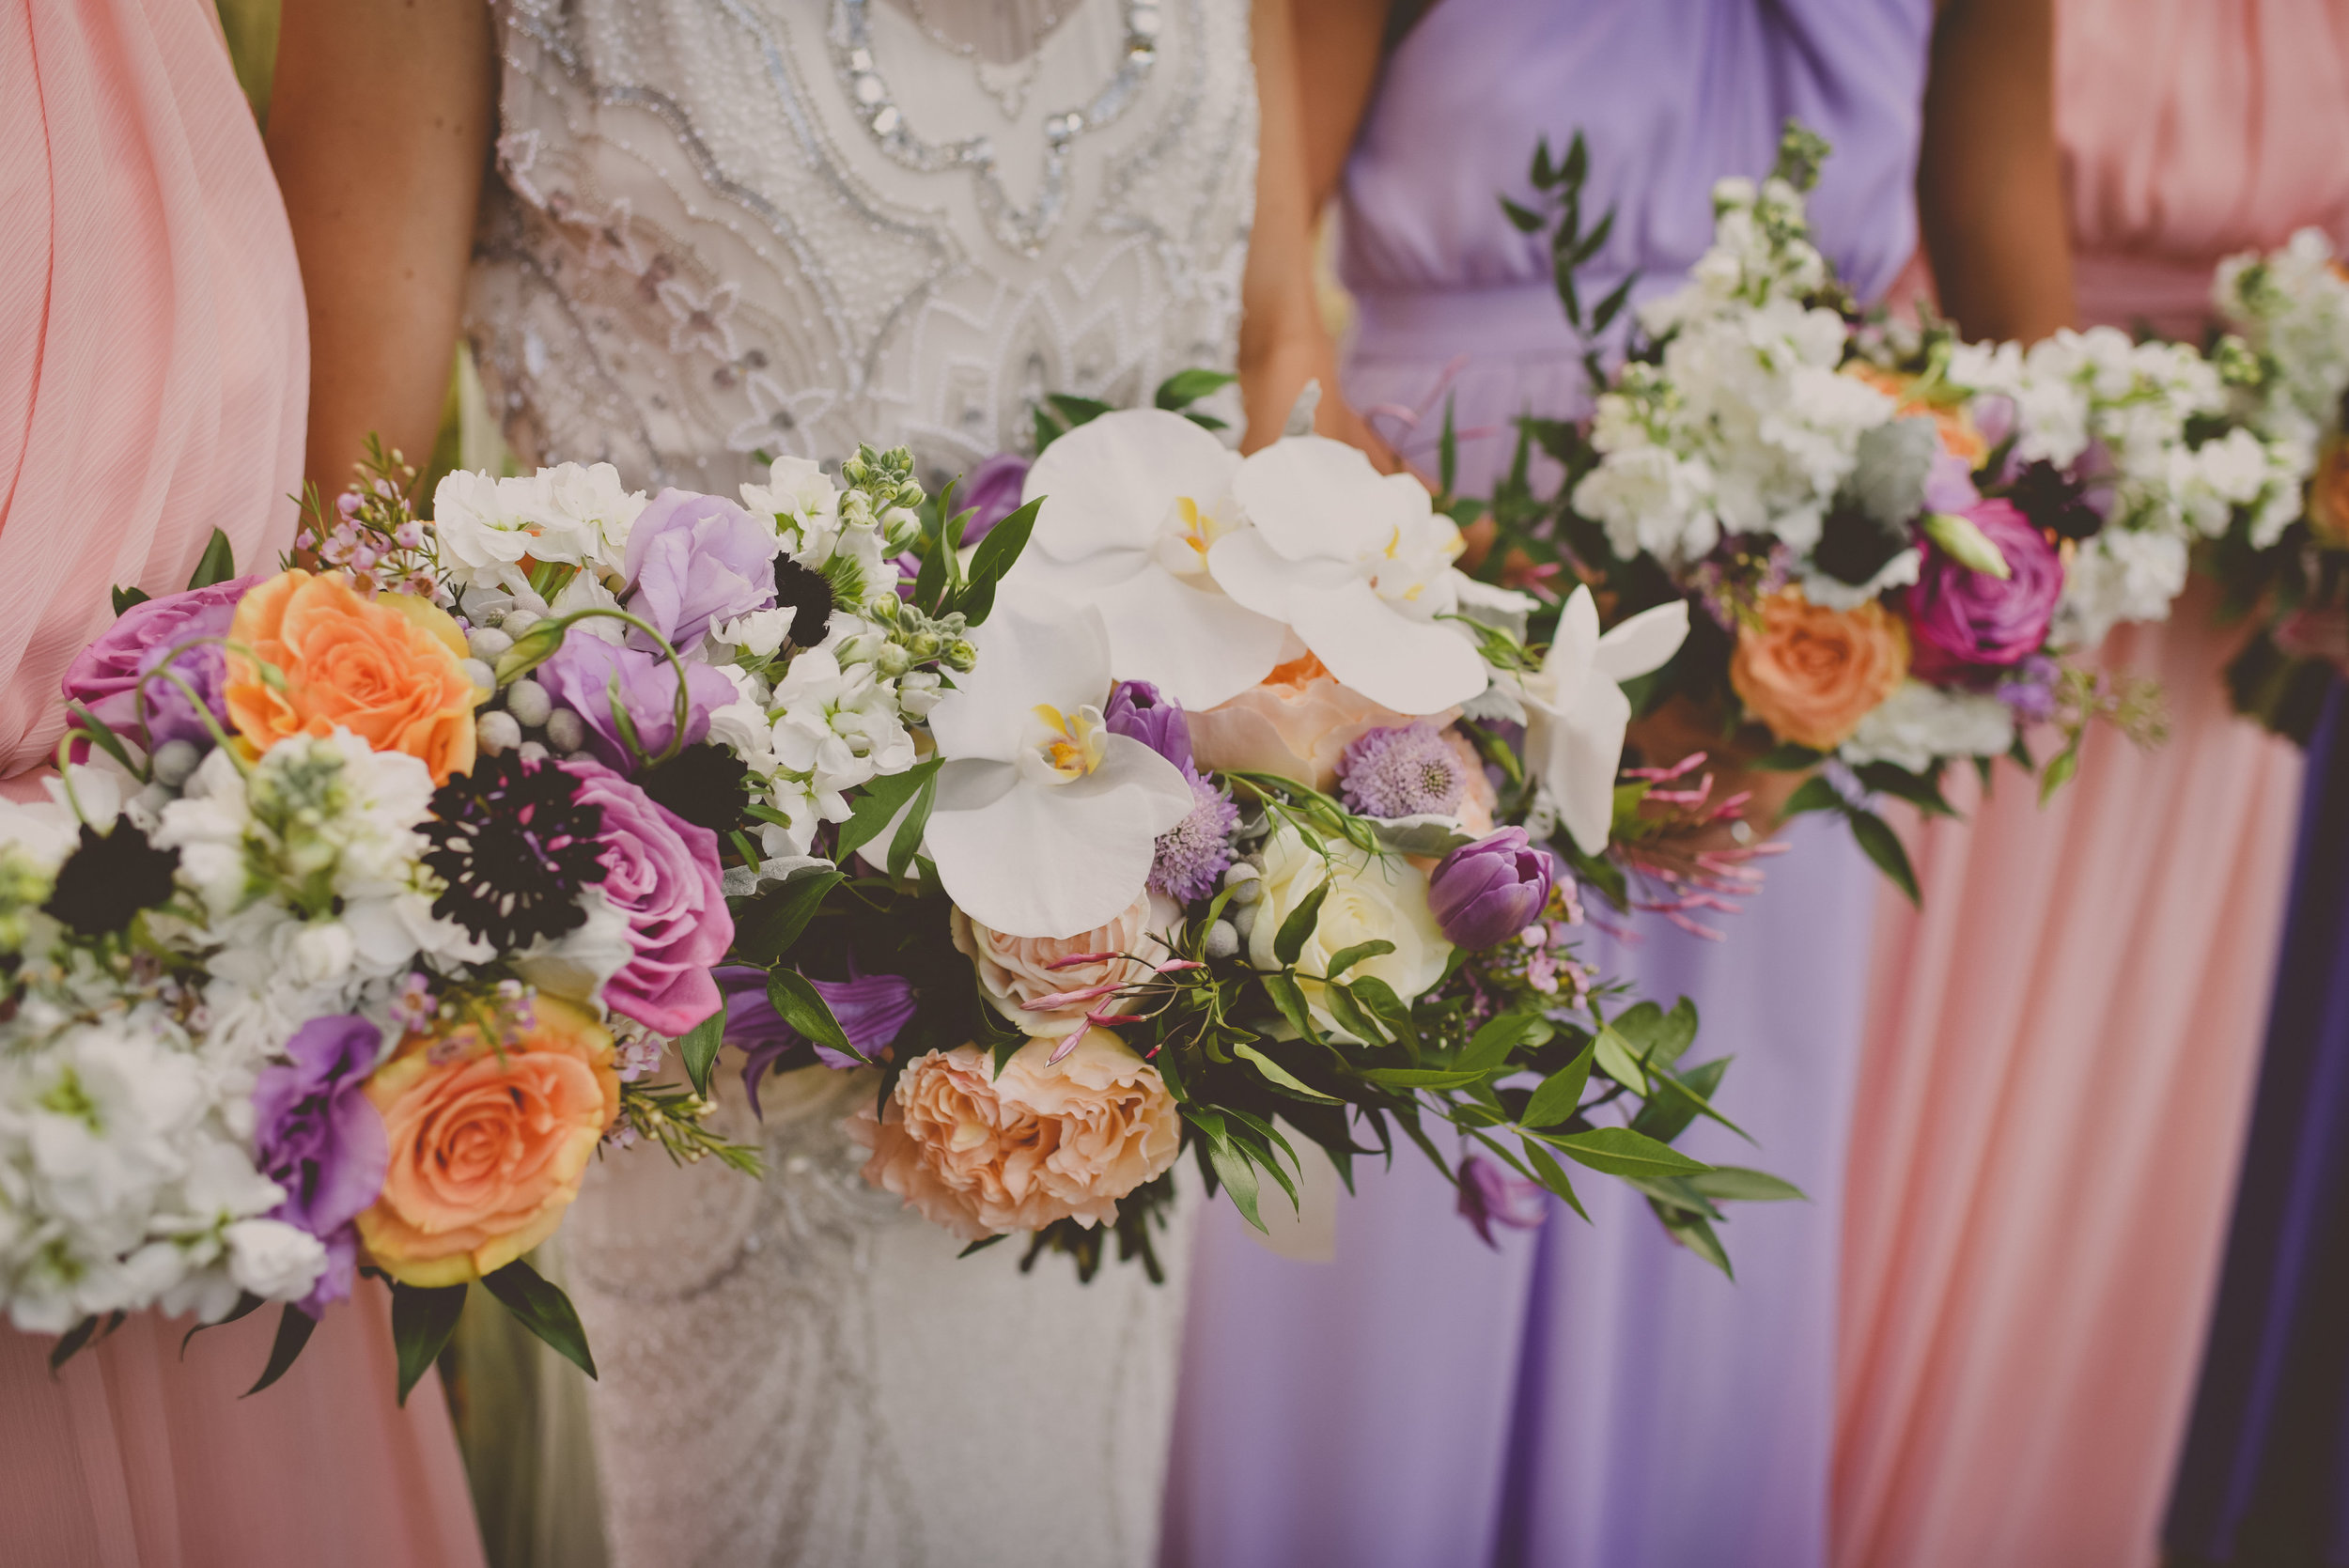 Bride and Bridesmaid Bouquets, Purple and Orange, Peach and Lavender